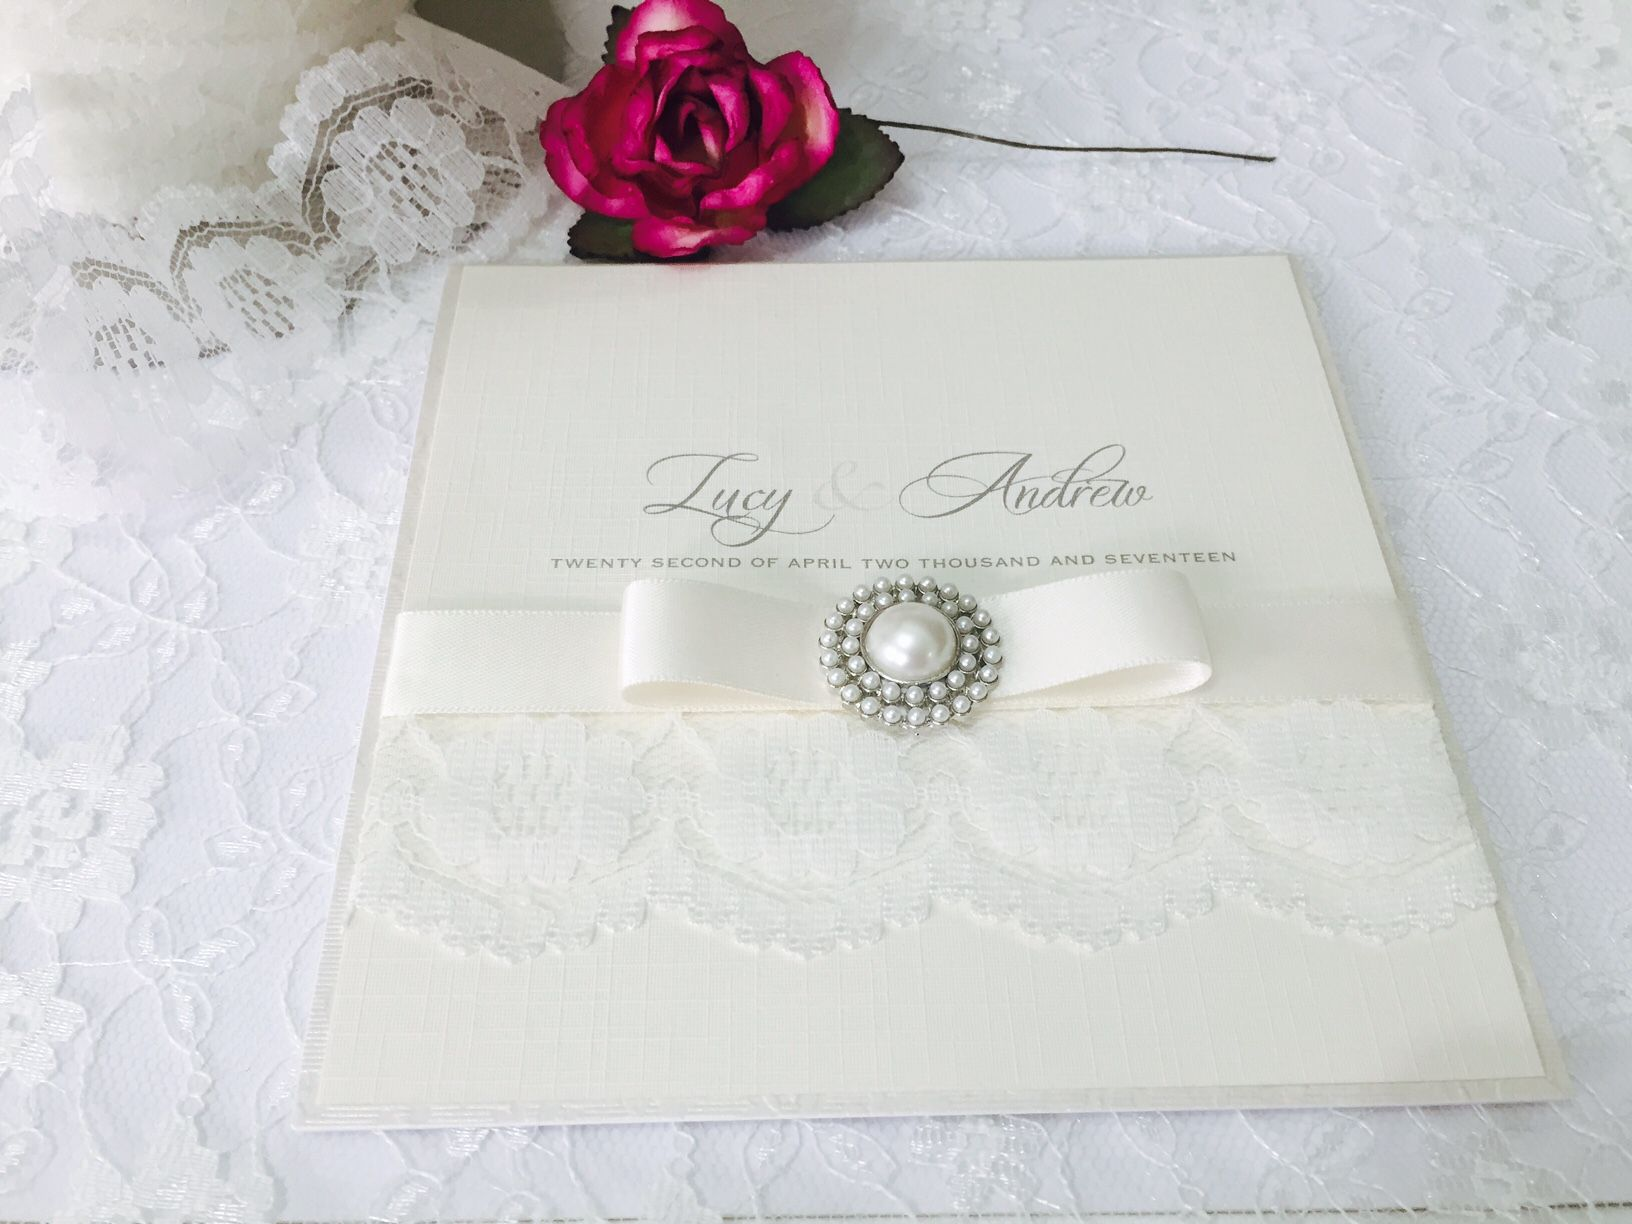 Luxury vintage retro style invitation design